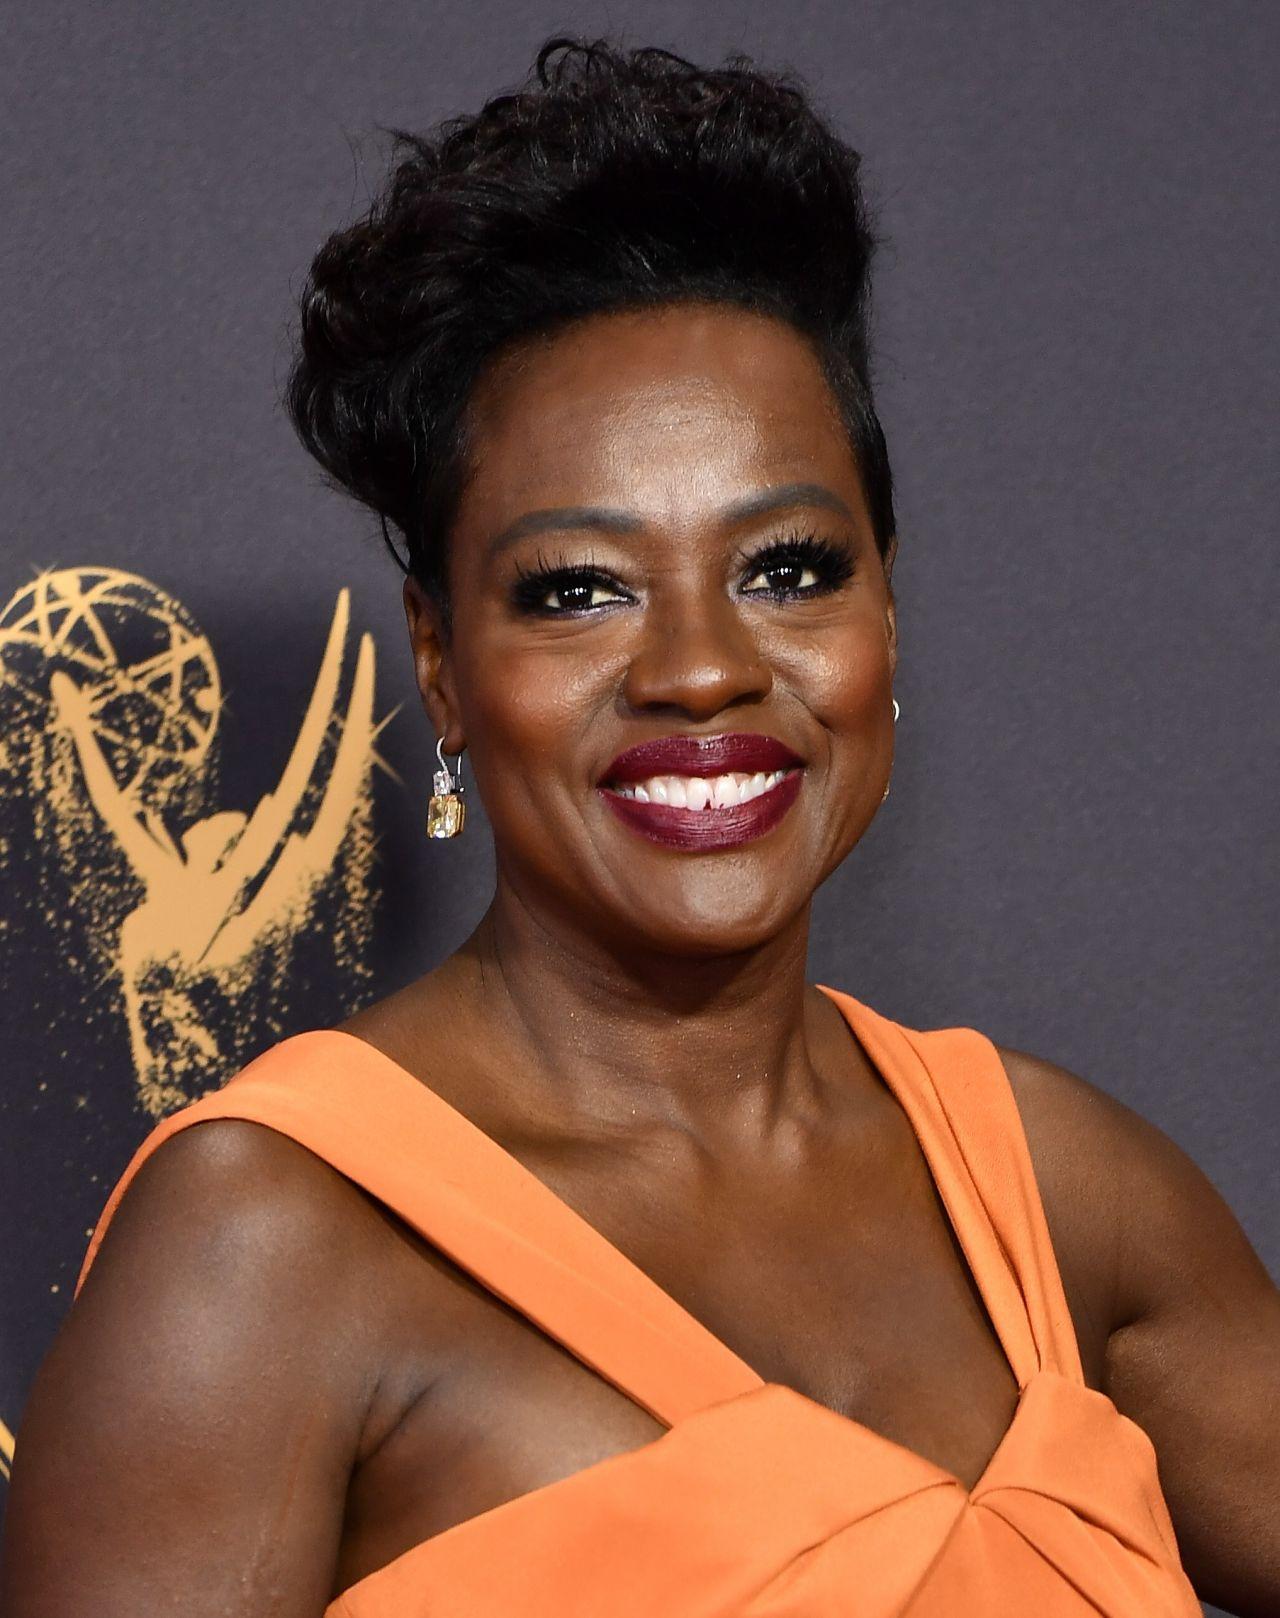 Viola Davis Emmy Awards In Los Angeles 09 17 2017